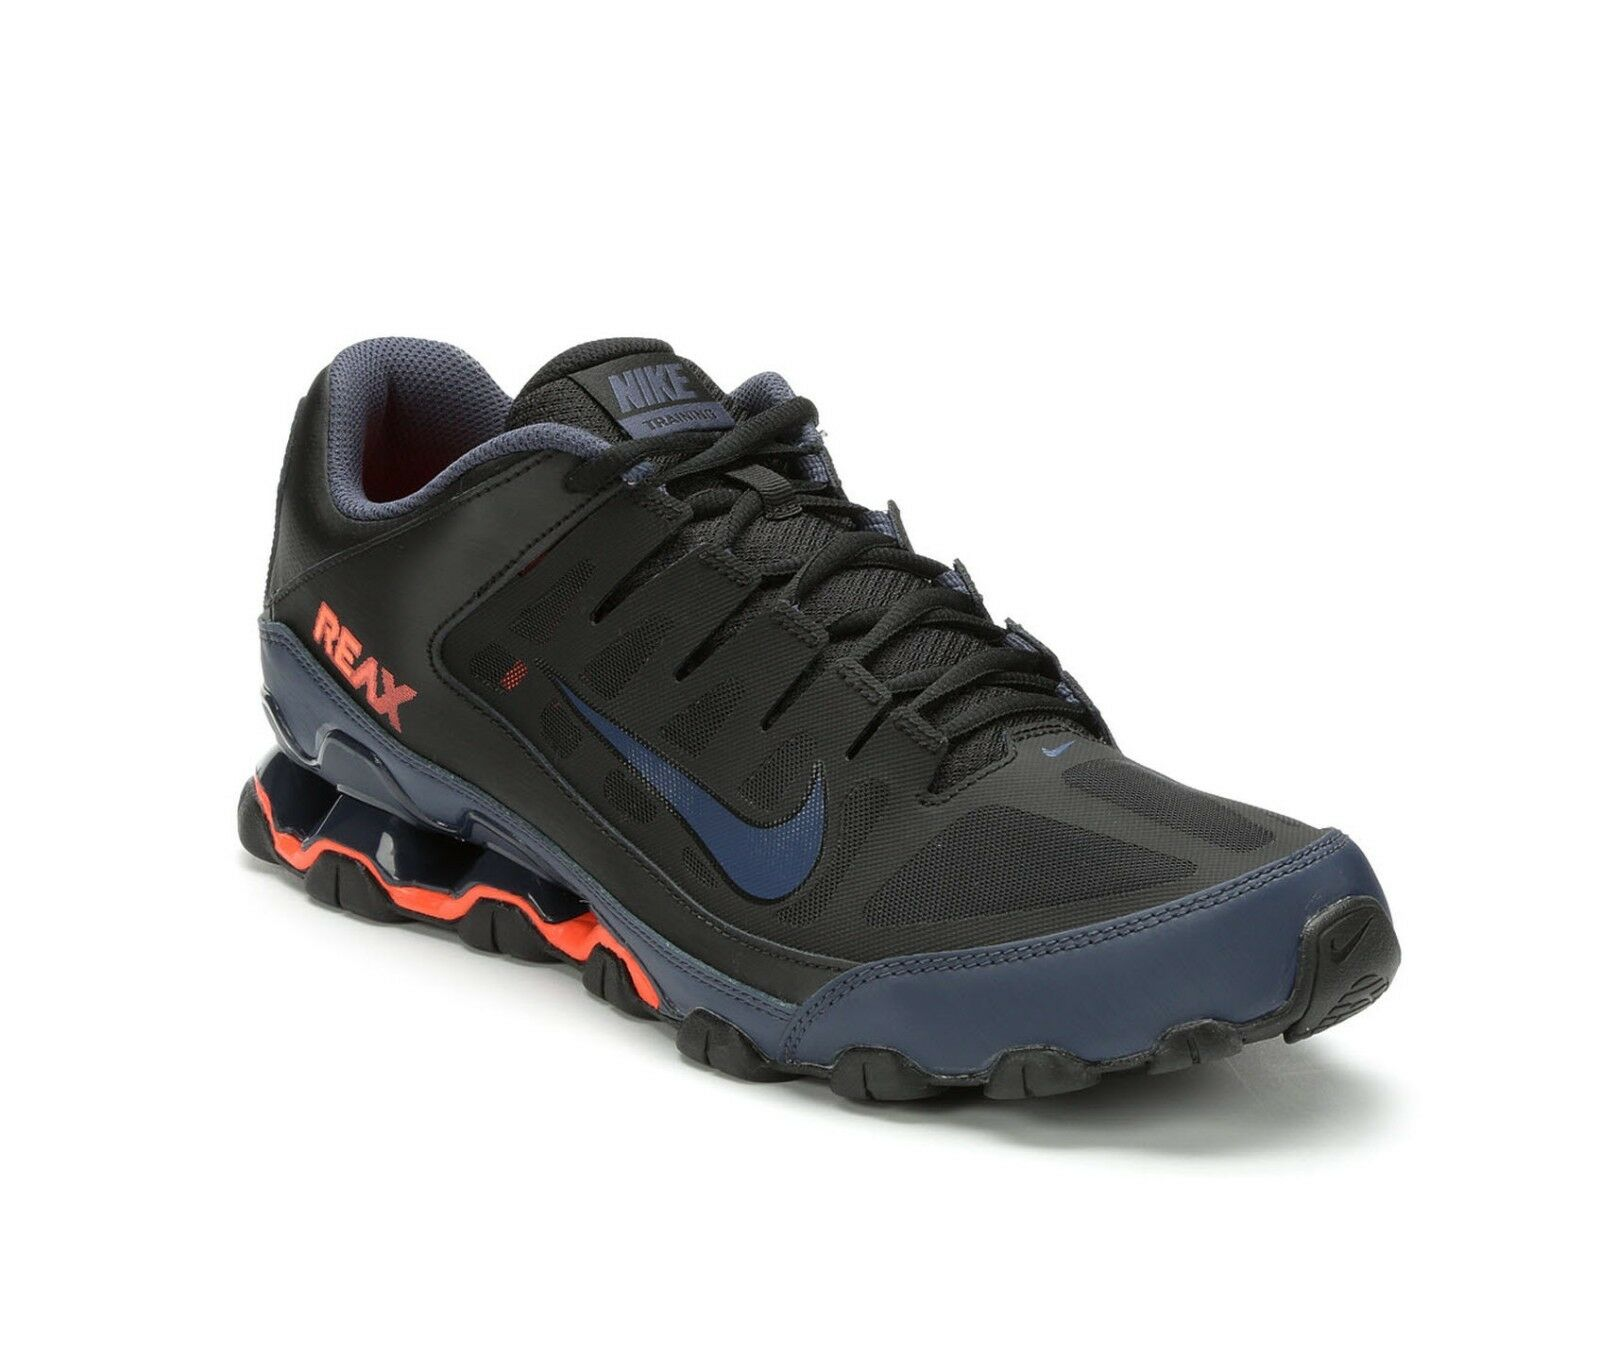 nike nike nike air jordanie 1 rétro   13 birmingham barons 325514-012 ouverture chaussures f89f7c